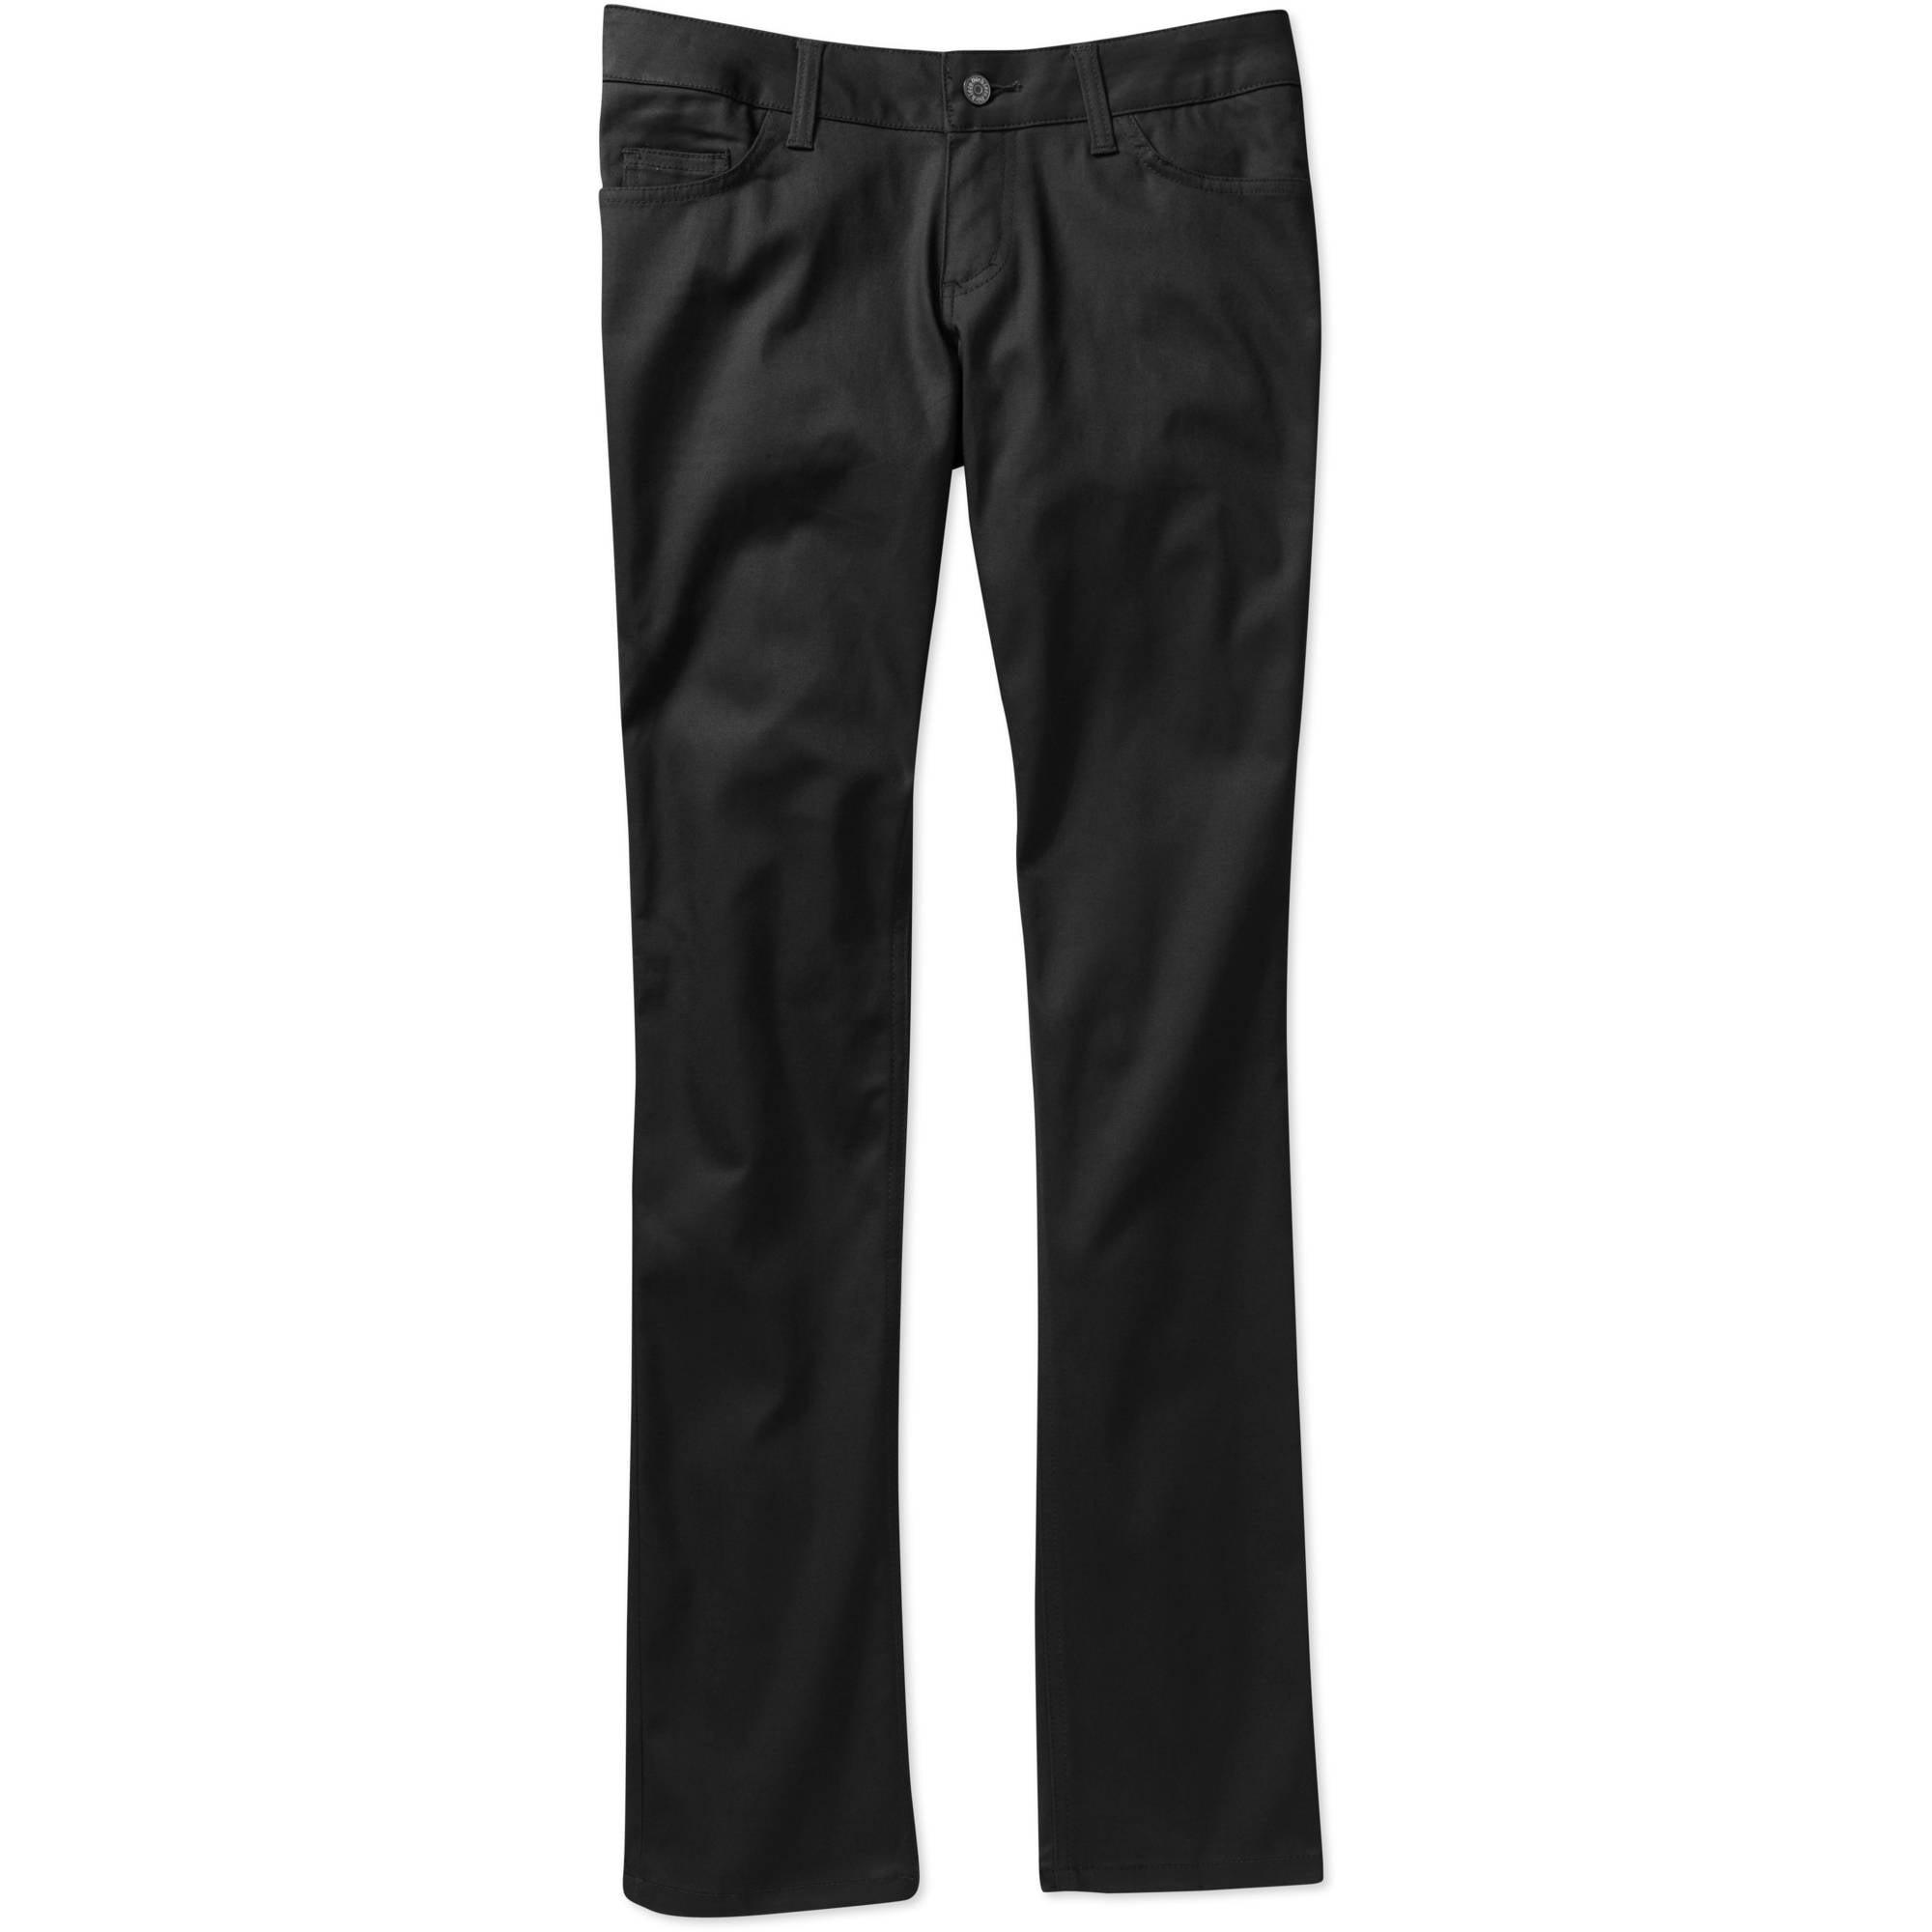 Genuine Dickies- Juniors' School Uniform 5-Pocket Stretch Twill Skinny Pants